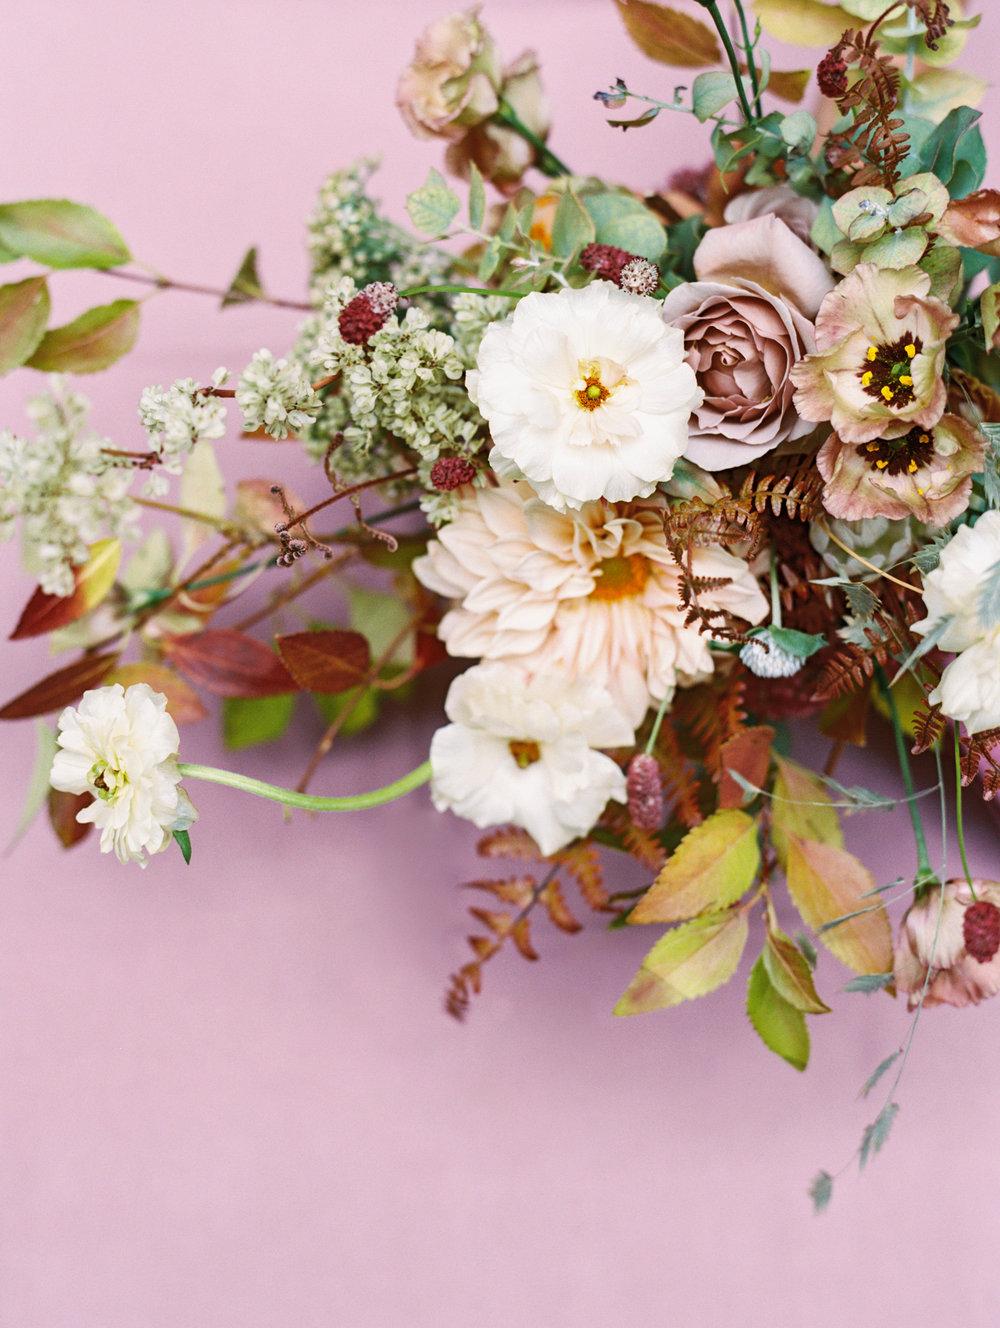 kelsandmichael_bridaleditorial_harvestelopement-15.jpg